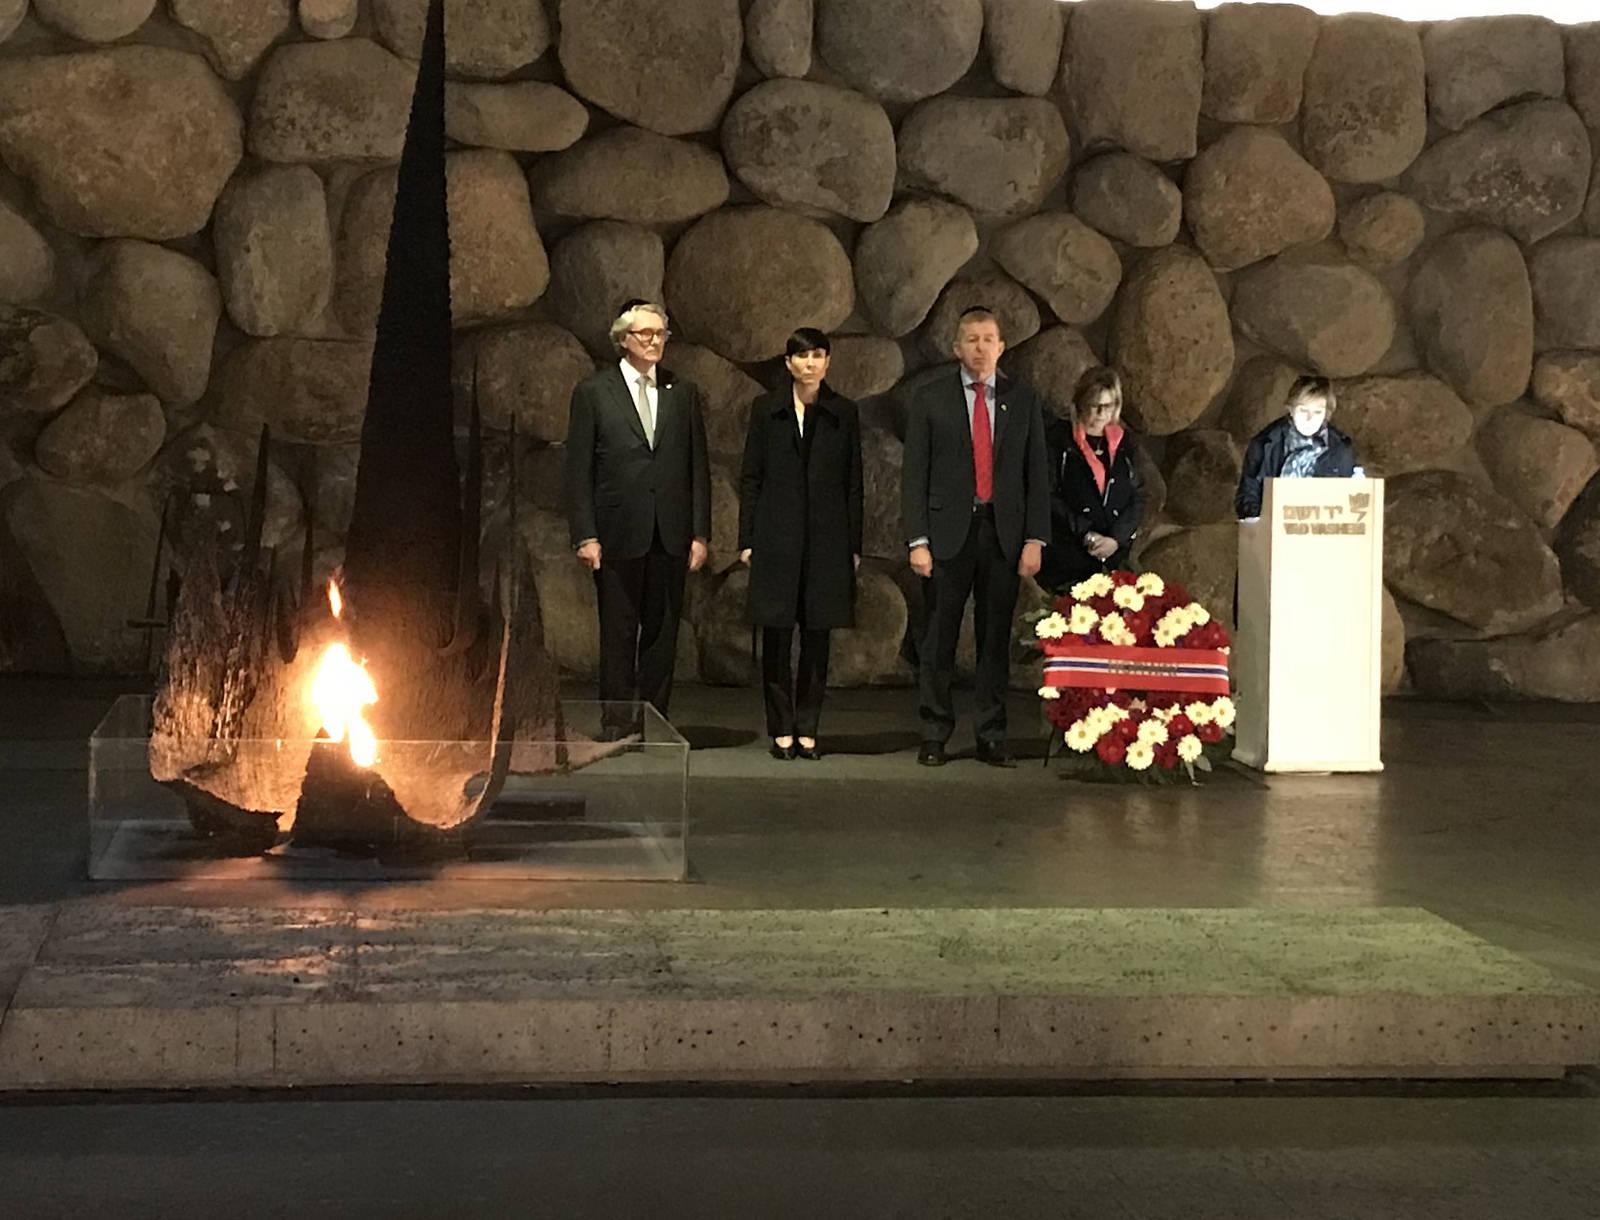 Søreide besøkte også Holocaust-museet Yad Vashem under sitt besøk i Jerusalem. (Foto: UD)